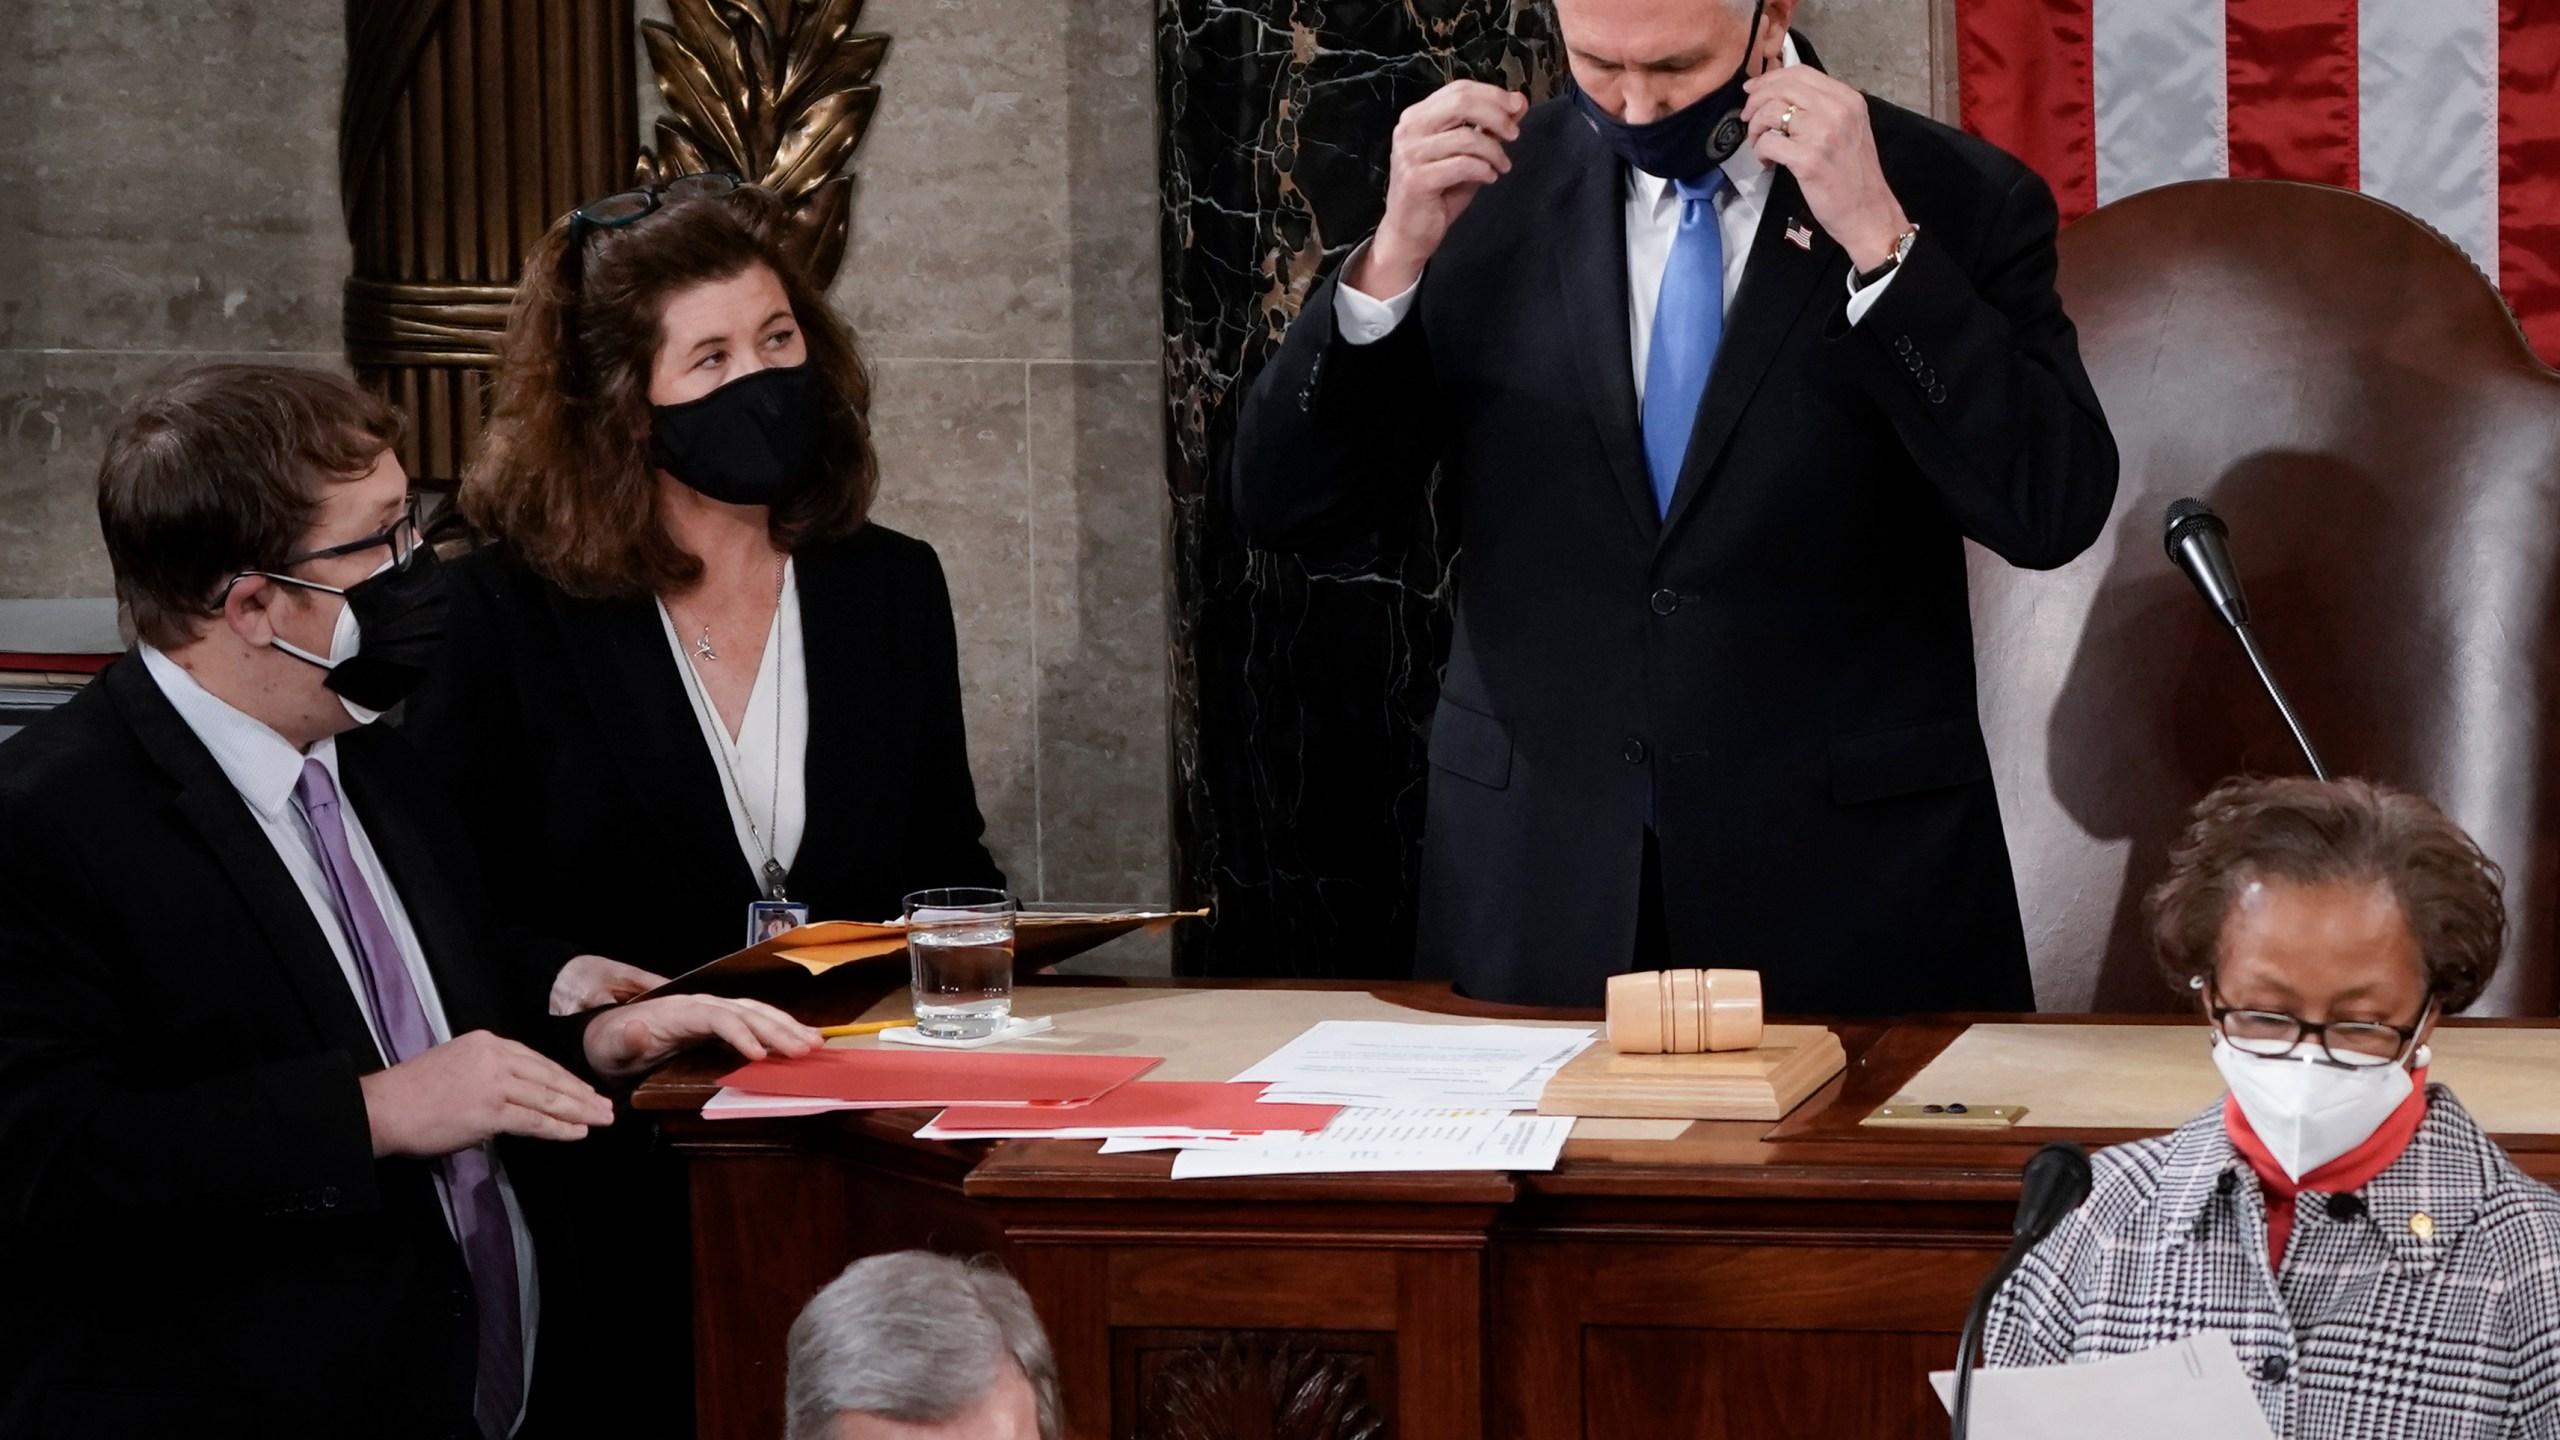 Mike Pence, Elizabeth MacDonough